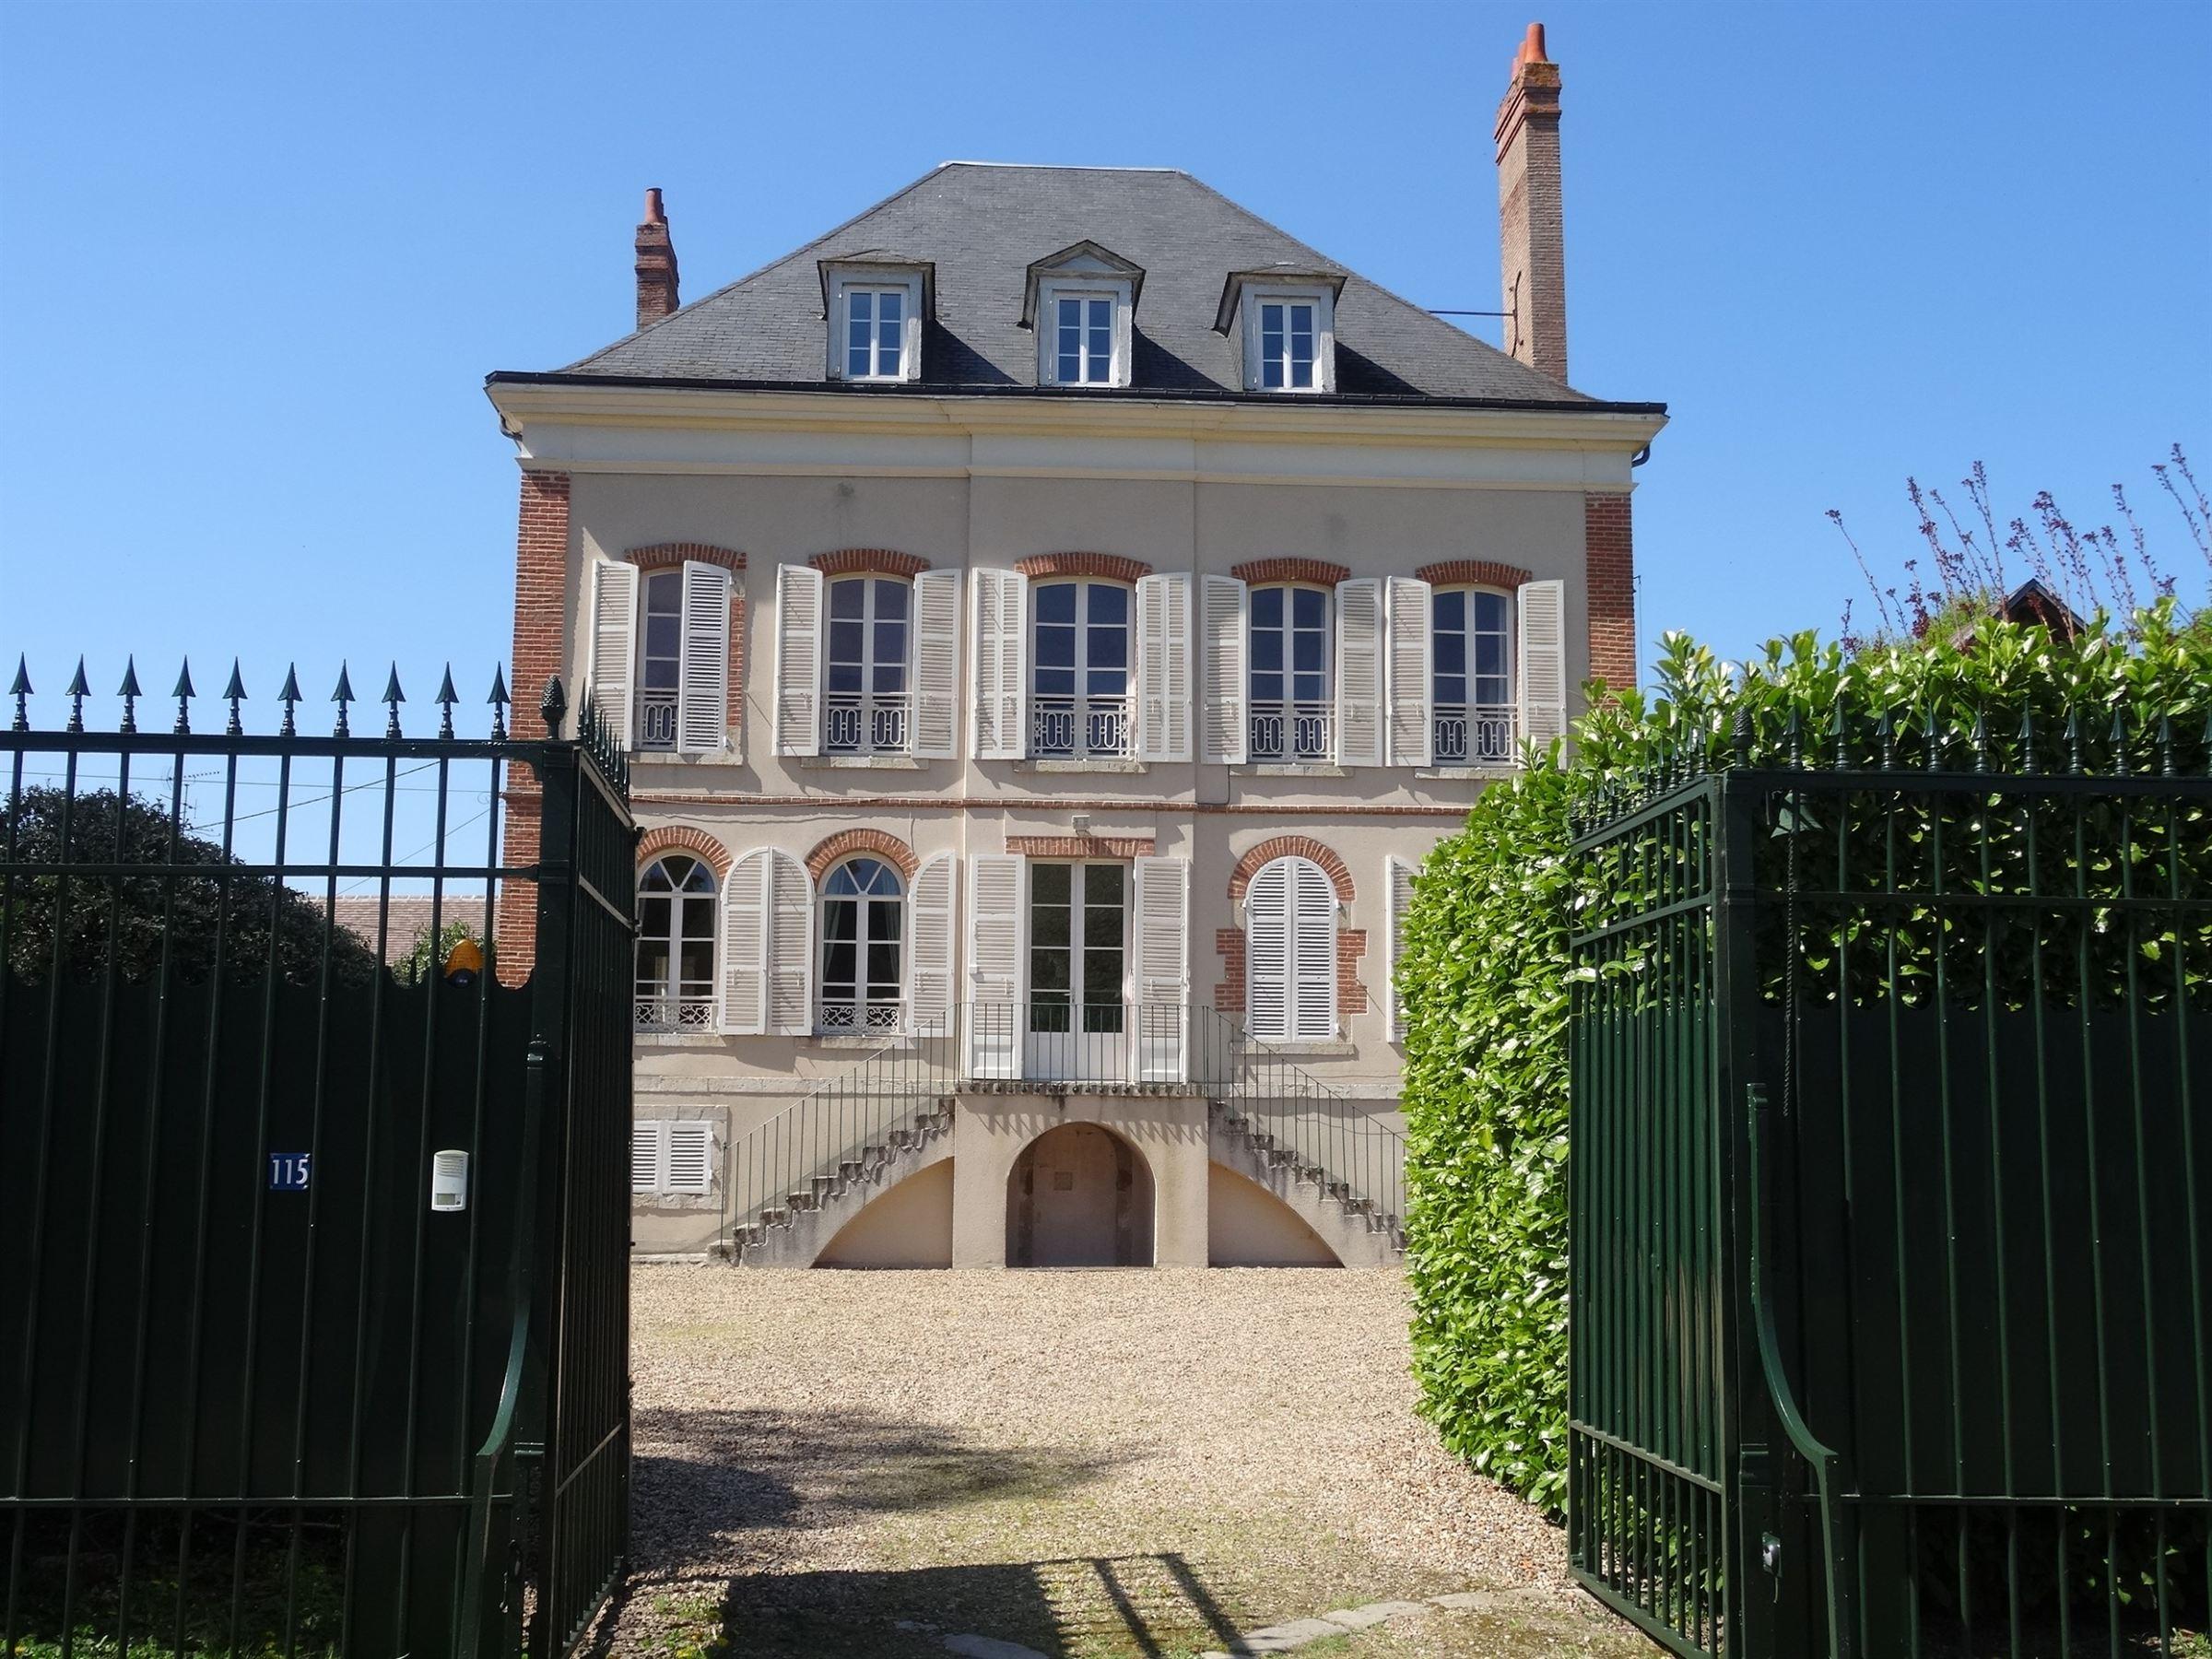 Single Family Home for Sale at St Jean de Braye, au calme Other Centre, Centre, 45800 France